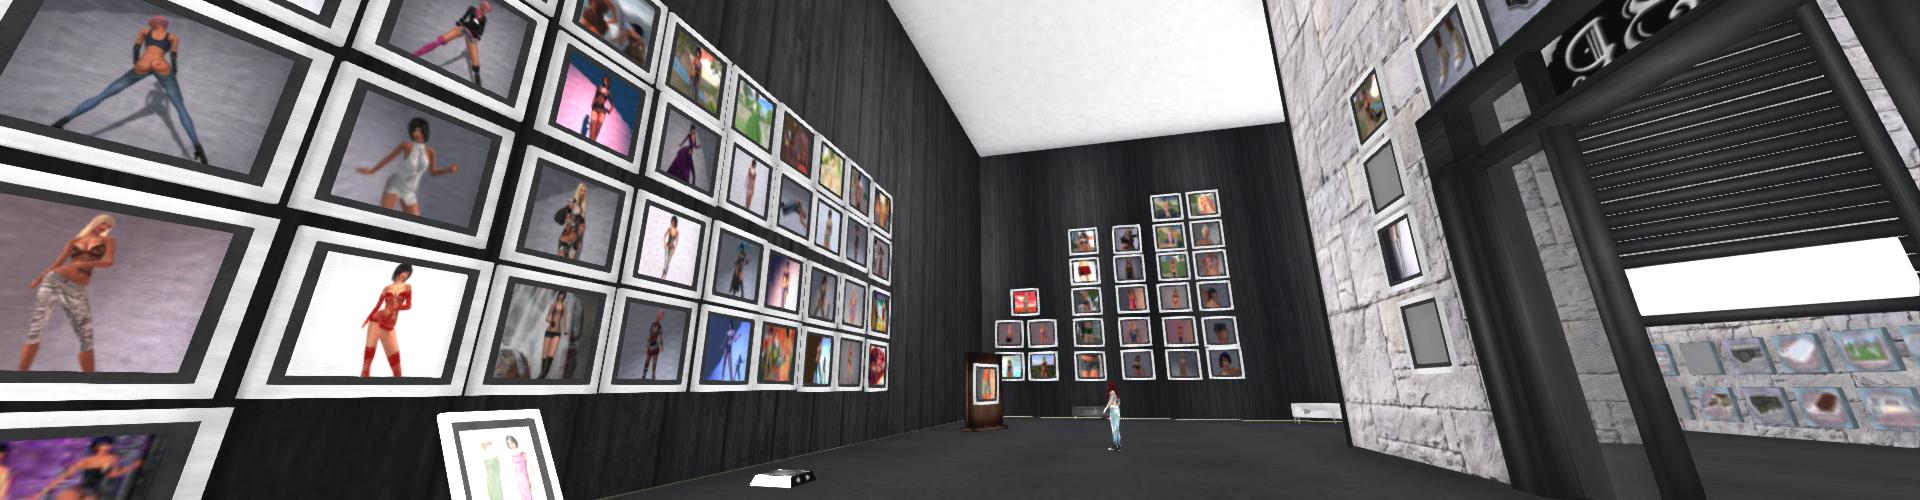 virtualmintaka-opensim-tienda-freebie